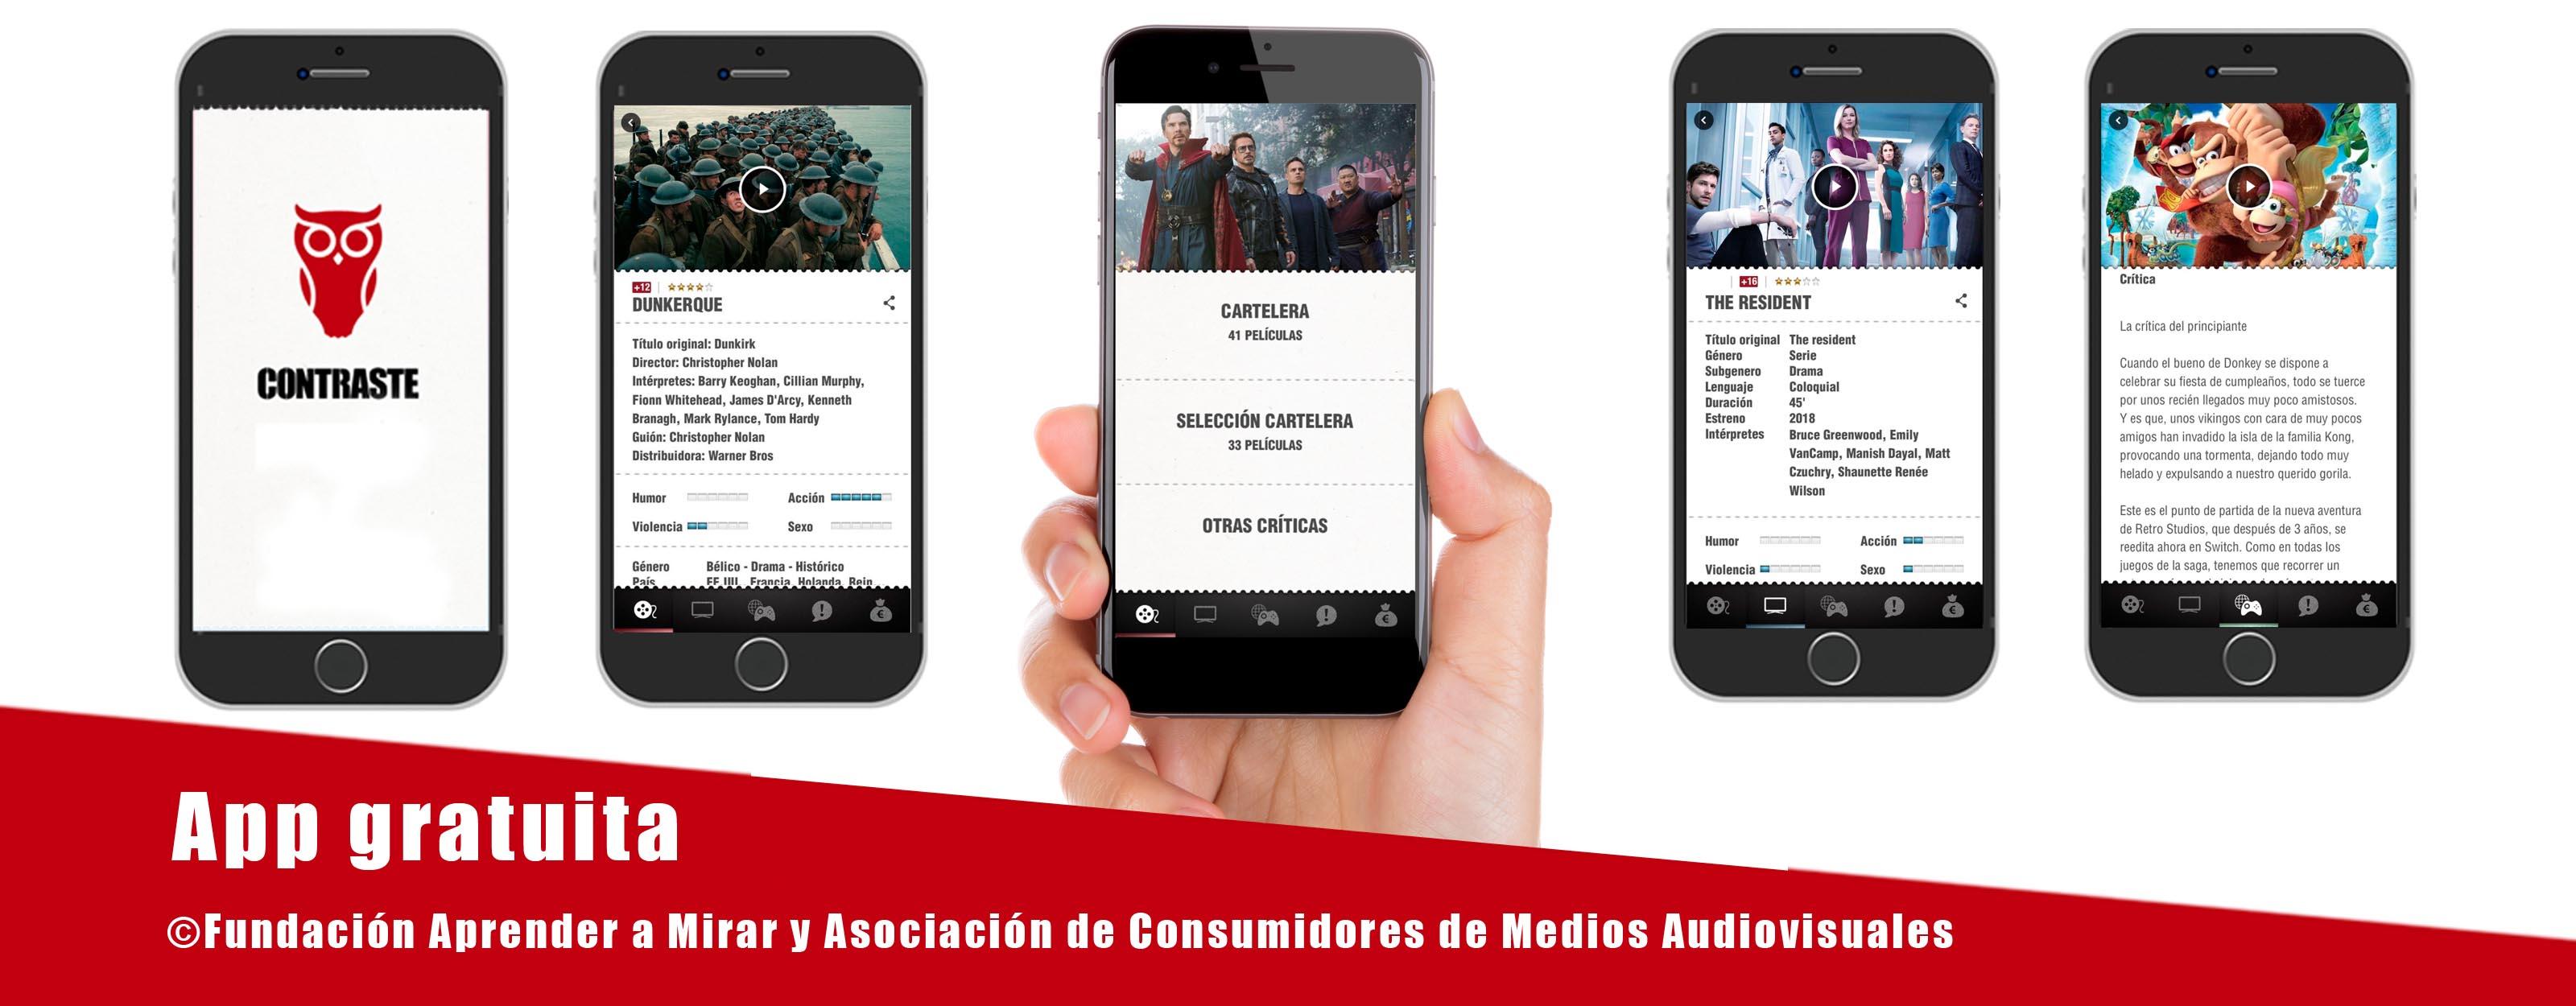 App Criticas Cine Contraste